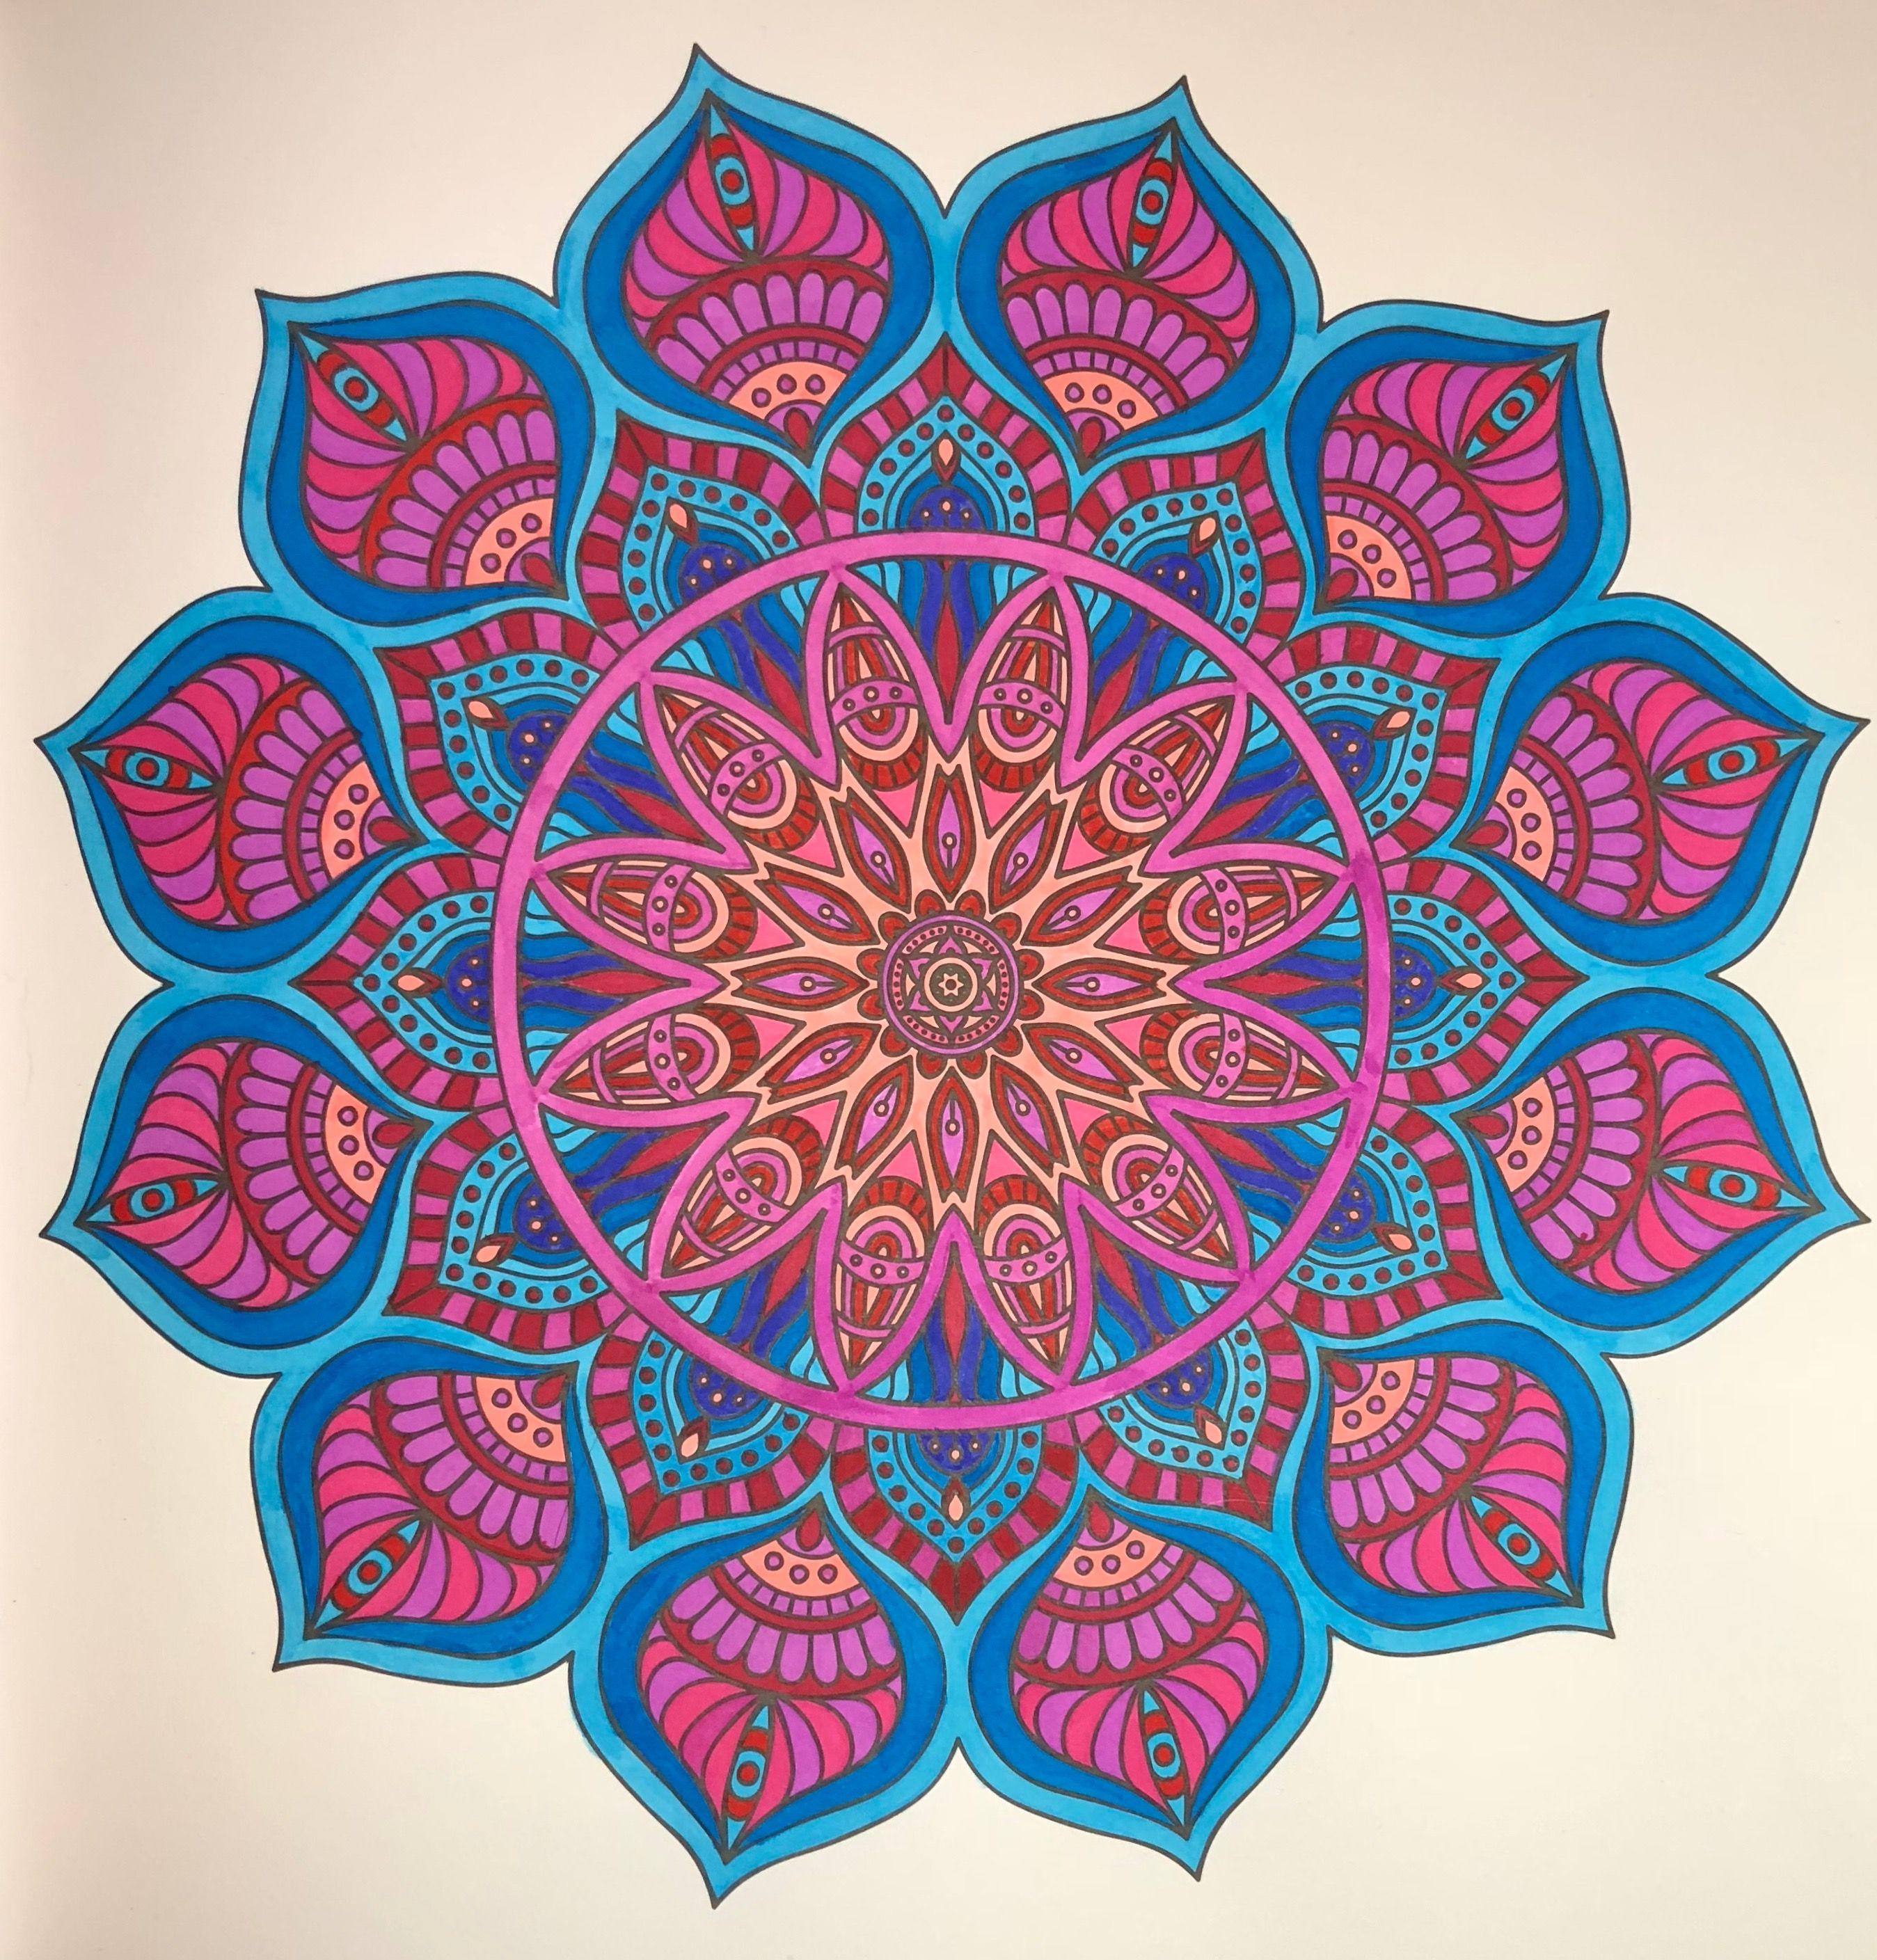 A Mandala From Mandala Meditation Coloring Book 2015 Colored By B Holmes 4 6 2018 With Arte Mandala Coloring Pages Mandala Coloring Mandala Coloring Books